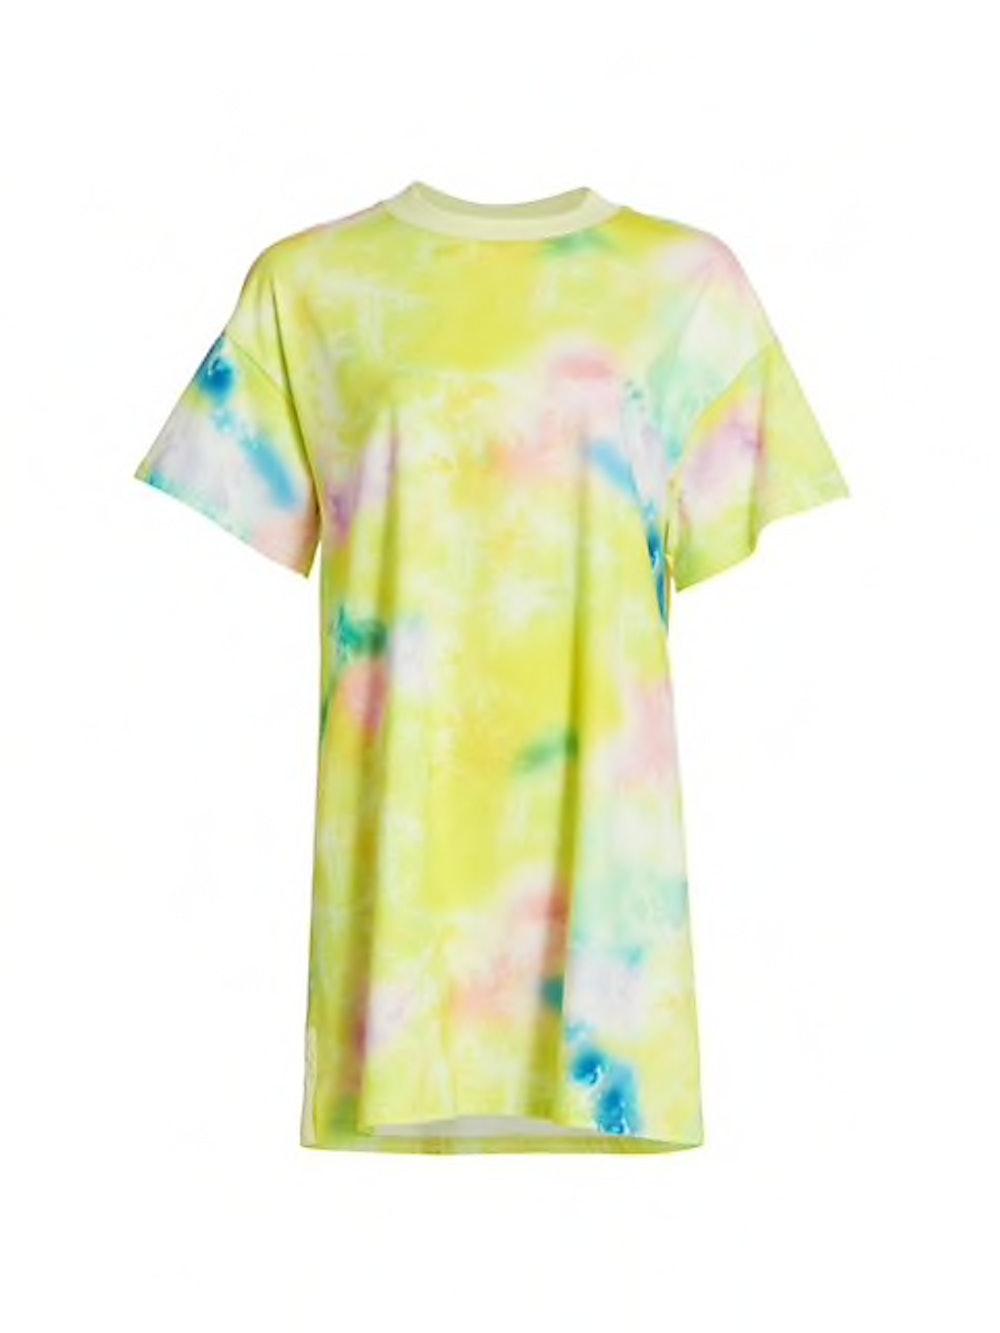 Alice + Olivia Garner Tie-Dye T-Shirt Dress